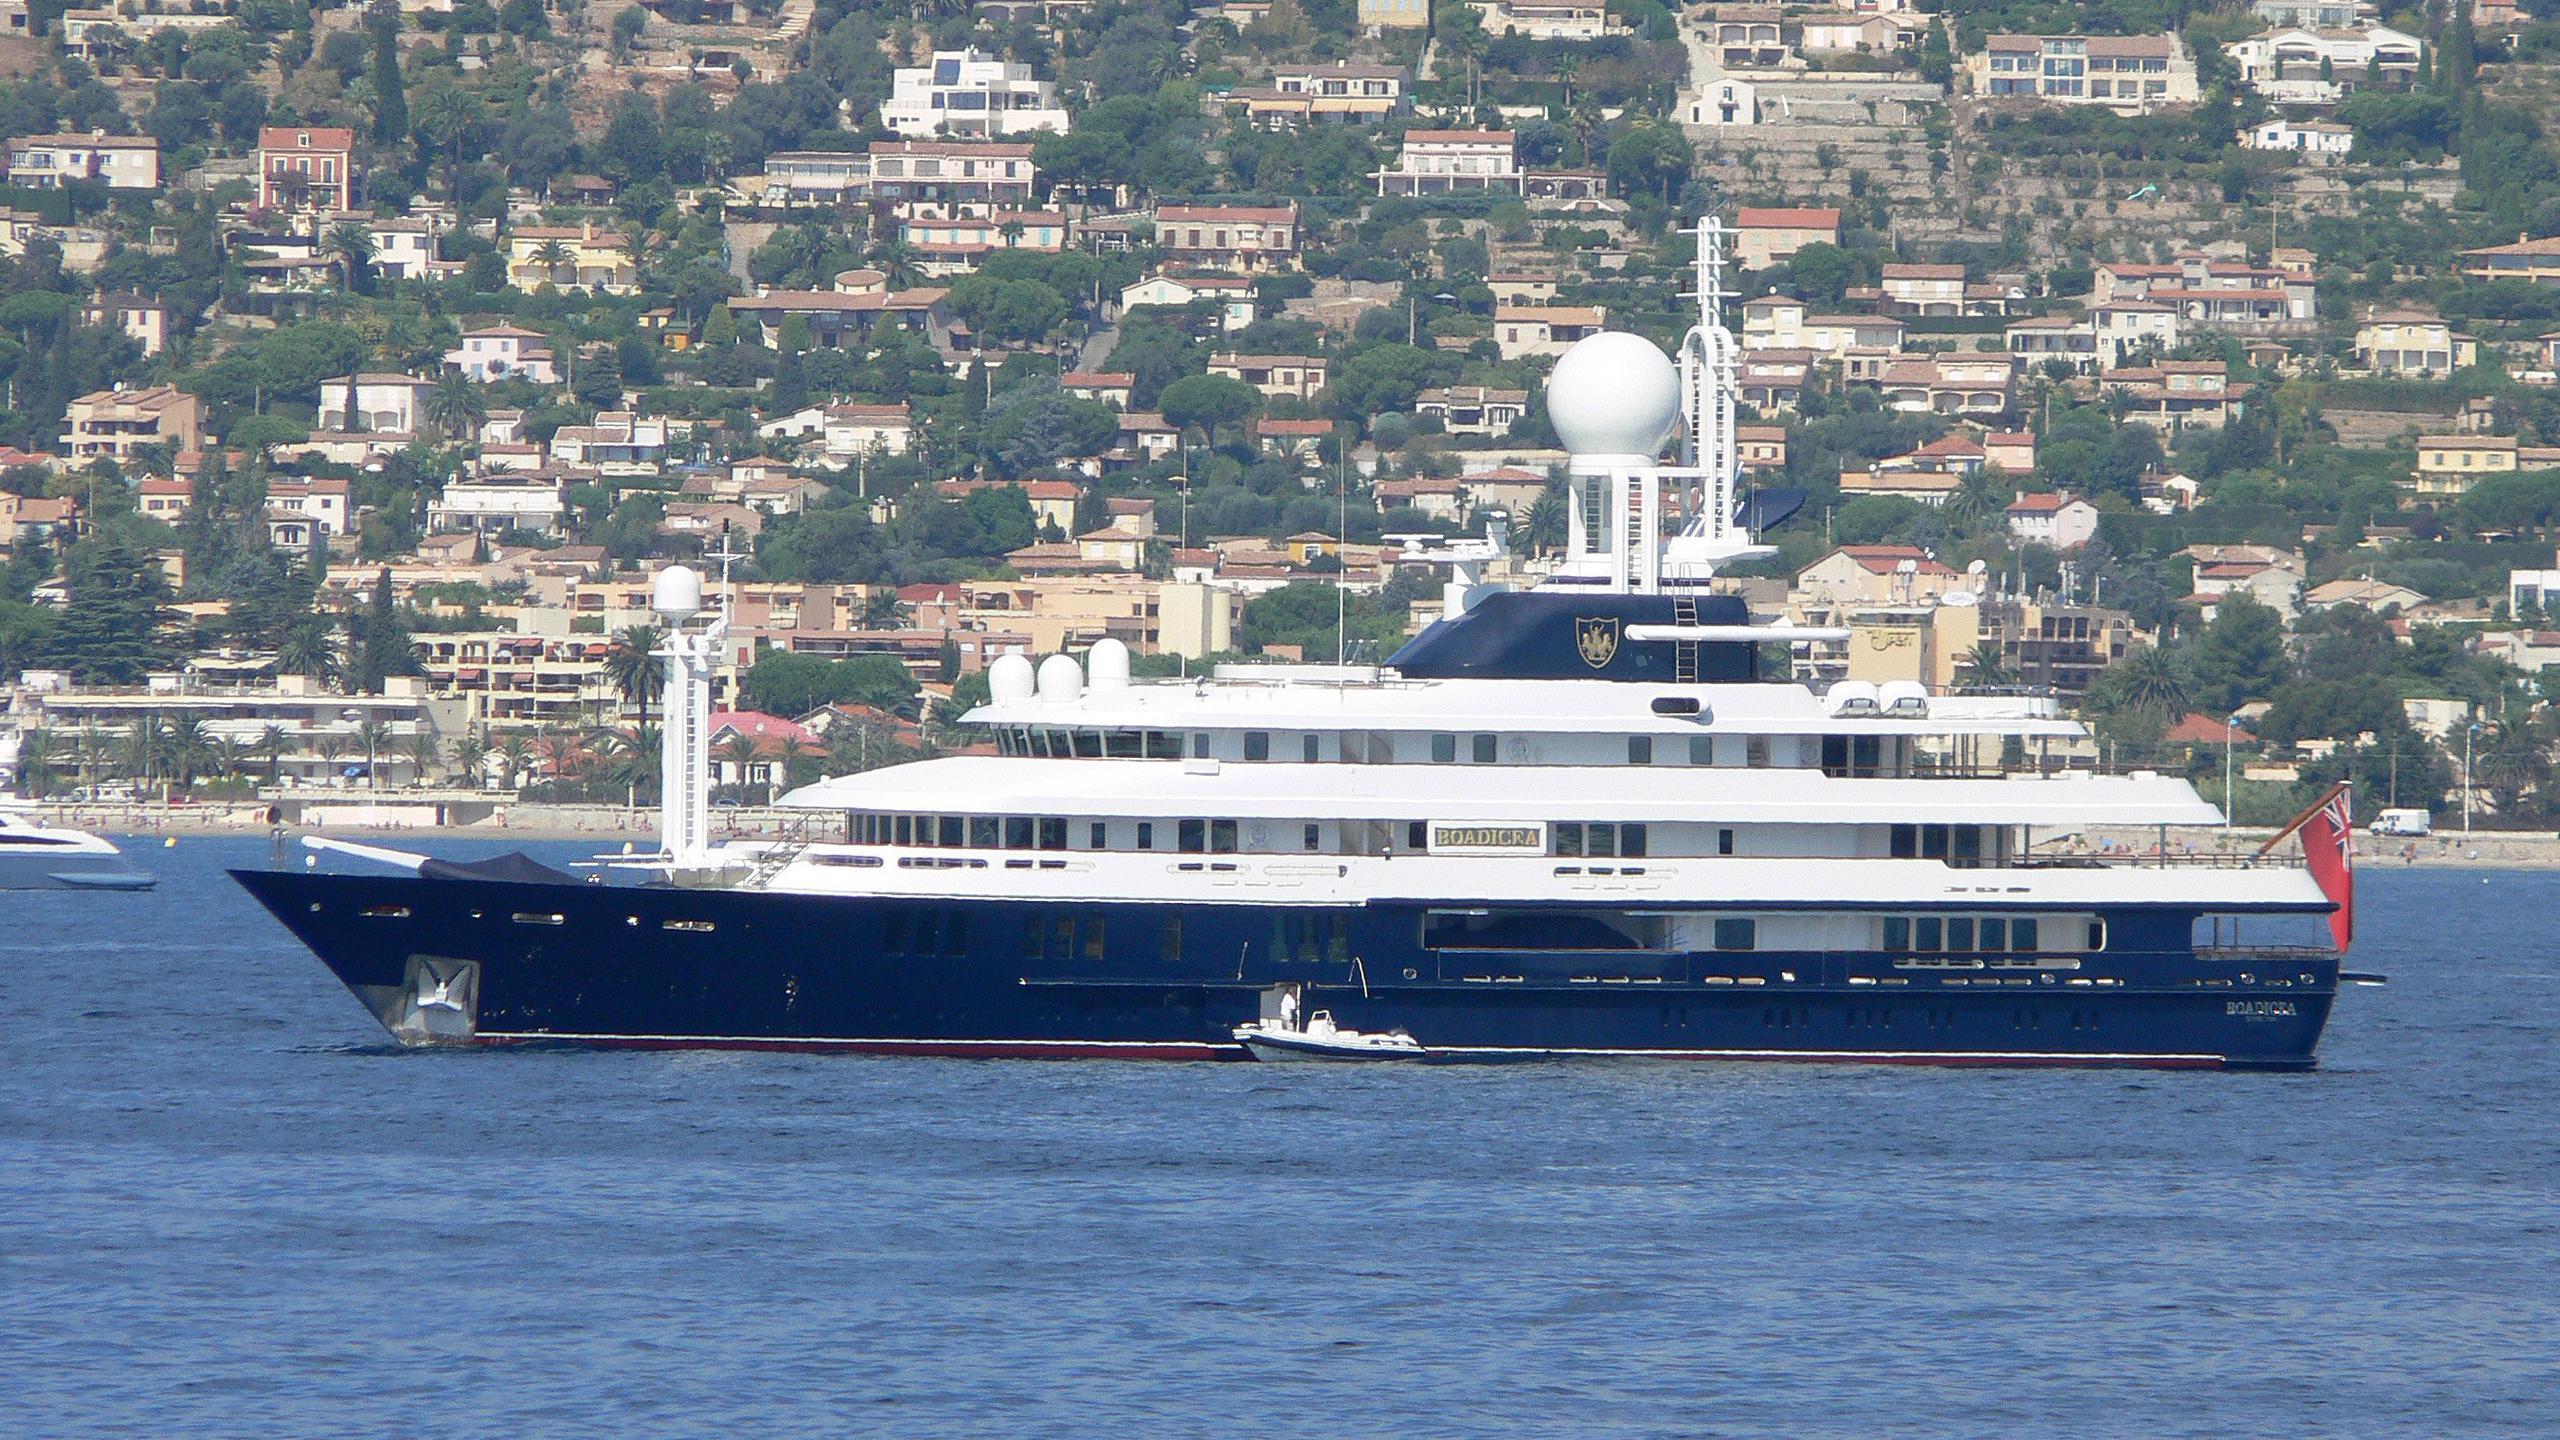 reborn-motor-yacht-amels-1999-75m-profile-before-refit